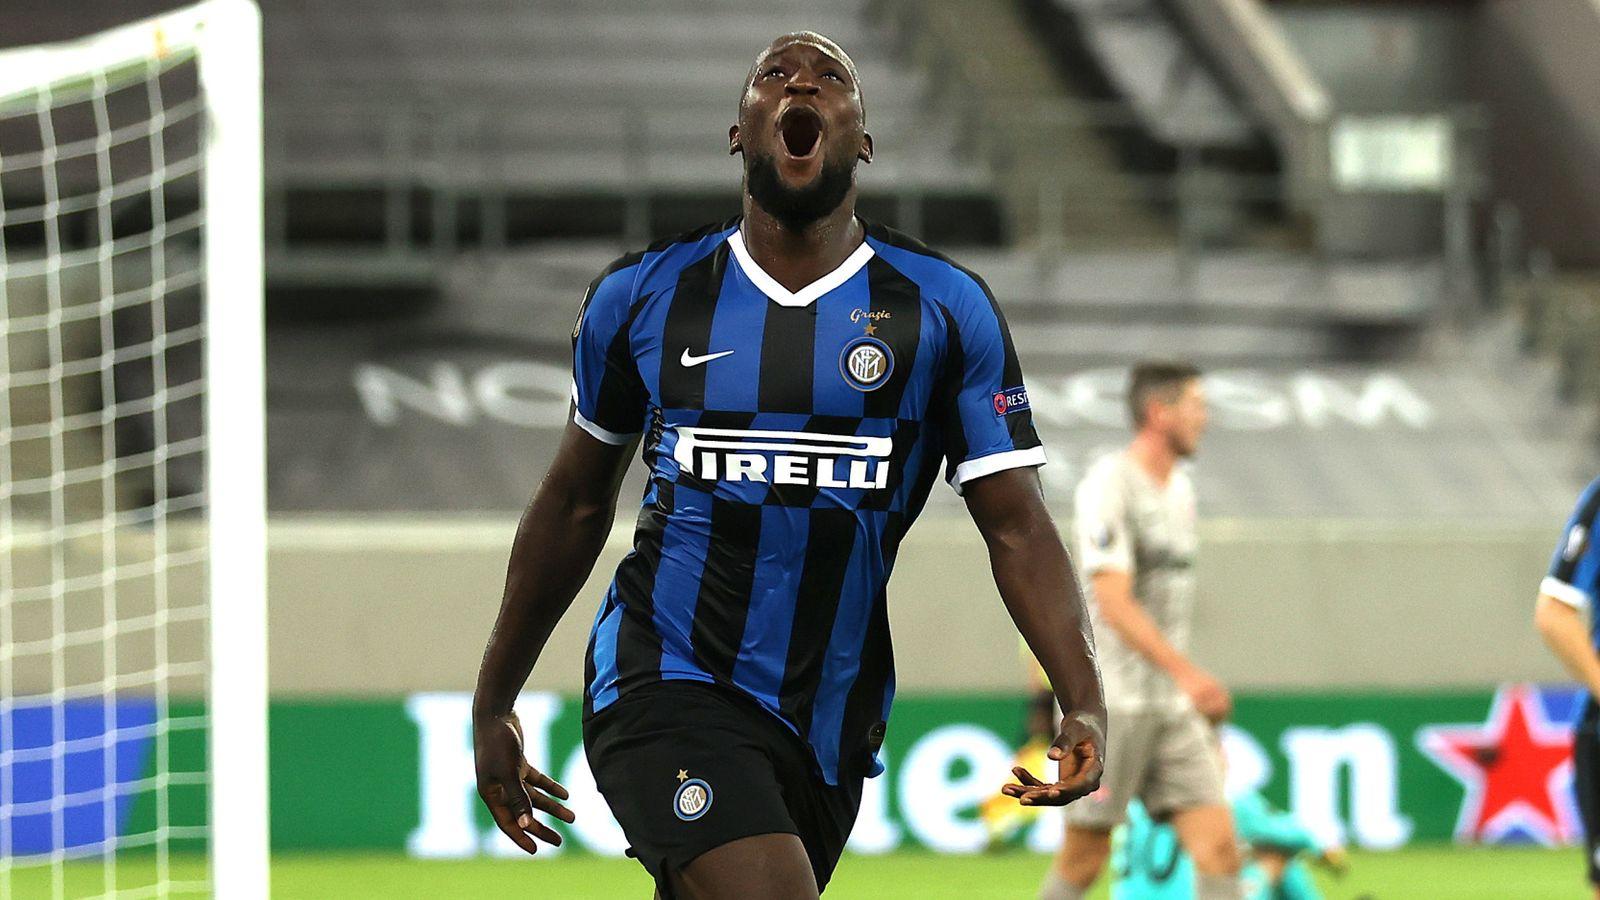 Inter Milan 5-0 Shakhtar Donetsk: Romelu Lukaku scores twice as Antonio  Conte's side reach Europa League final | Football News